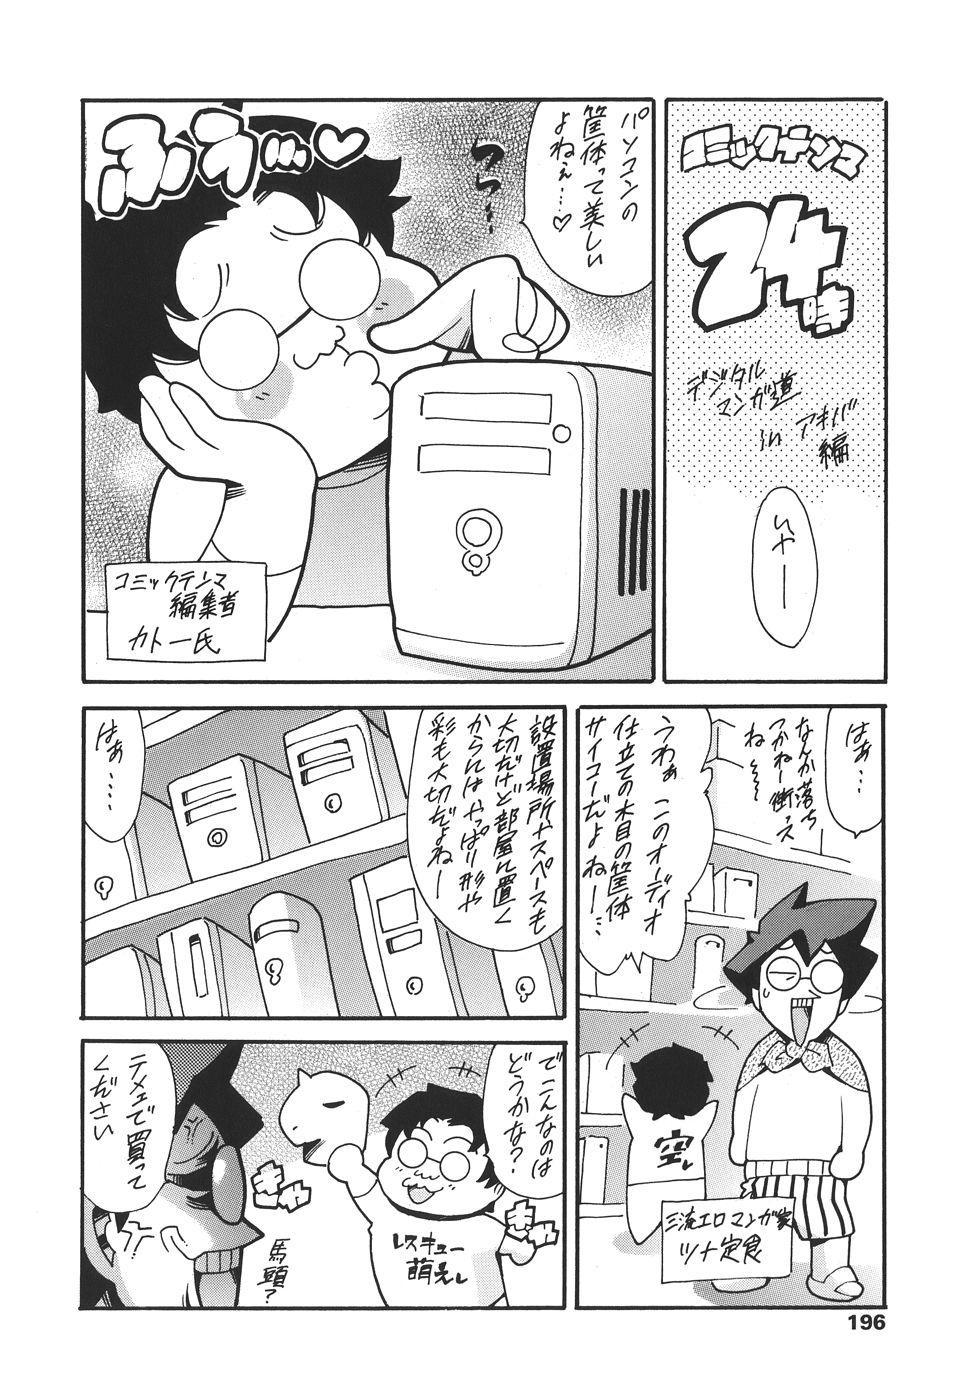 Katei no Jijou - Family's circumstances 187